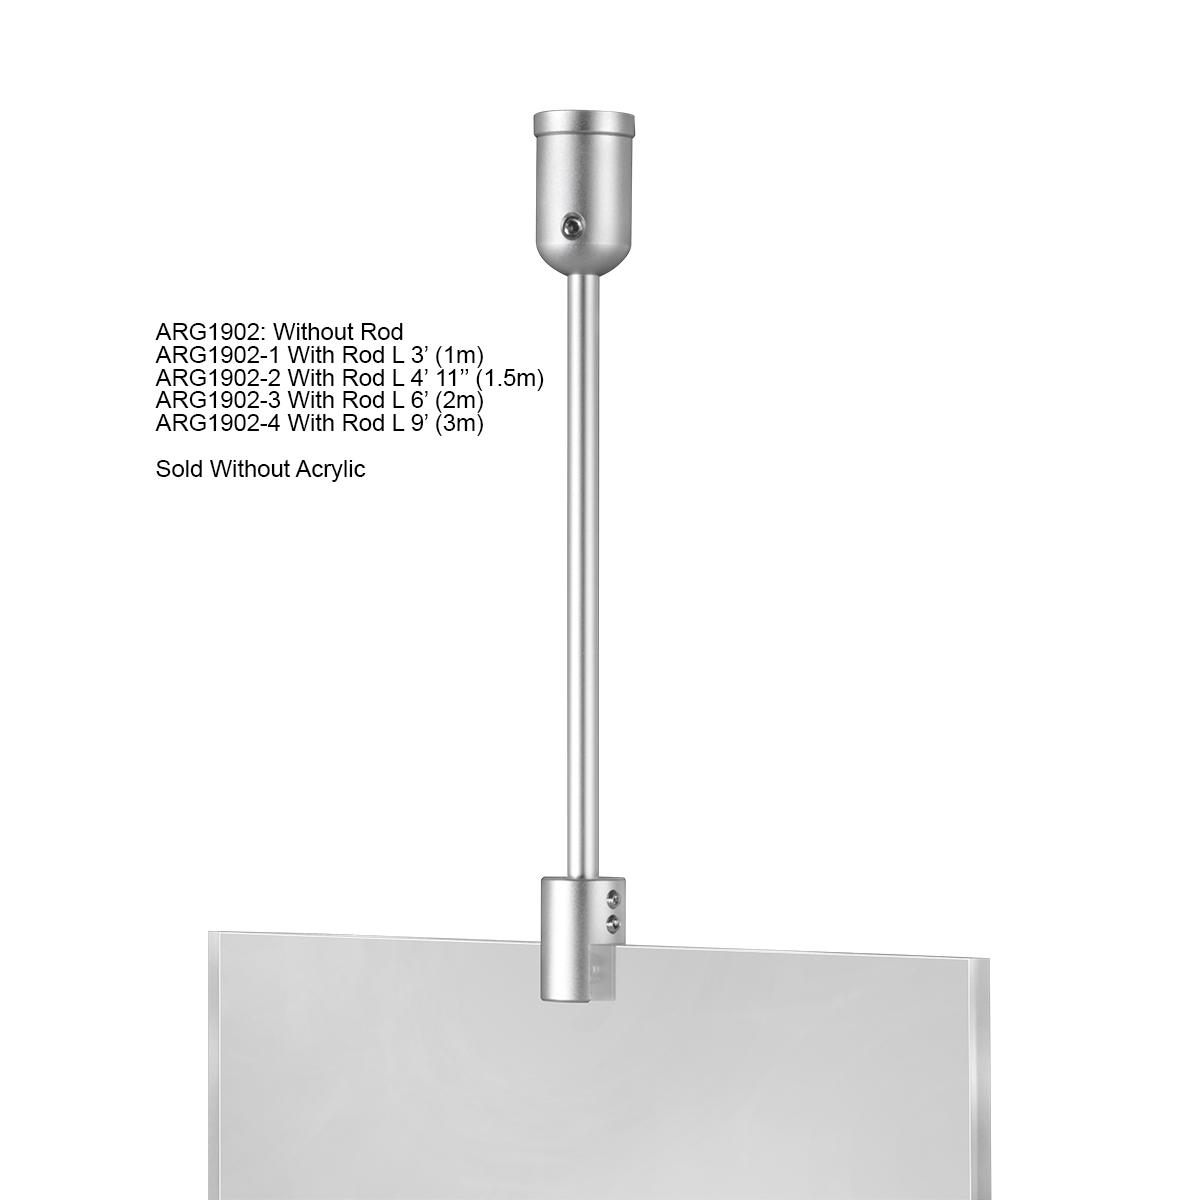 Ceiling Suspended Rod Kit - 6' - Aluminum